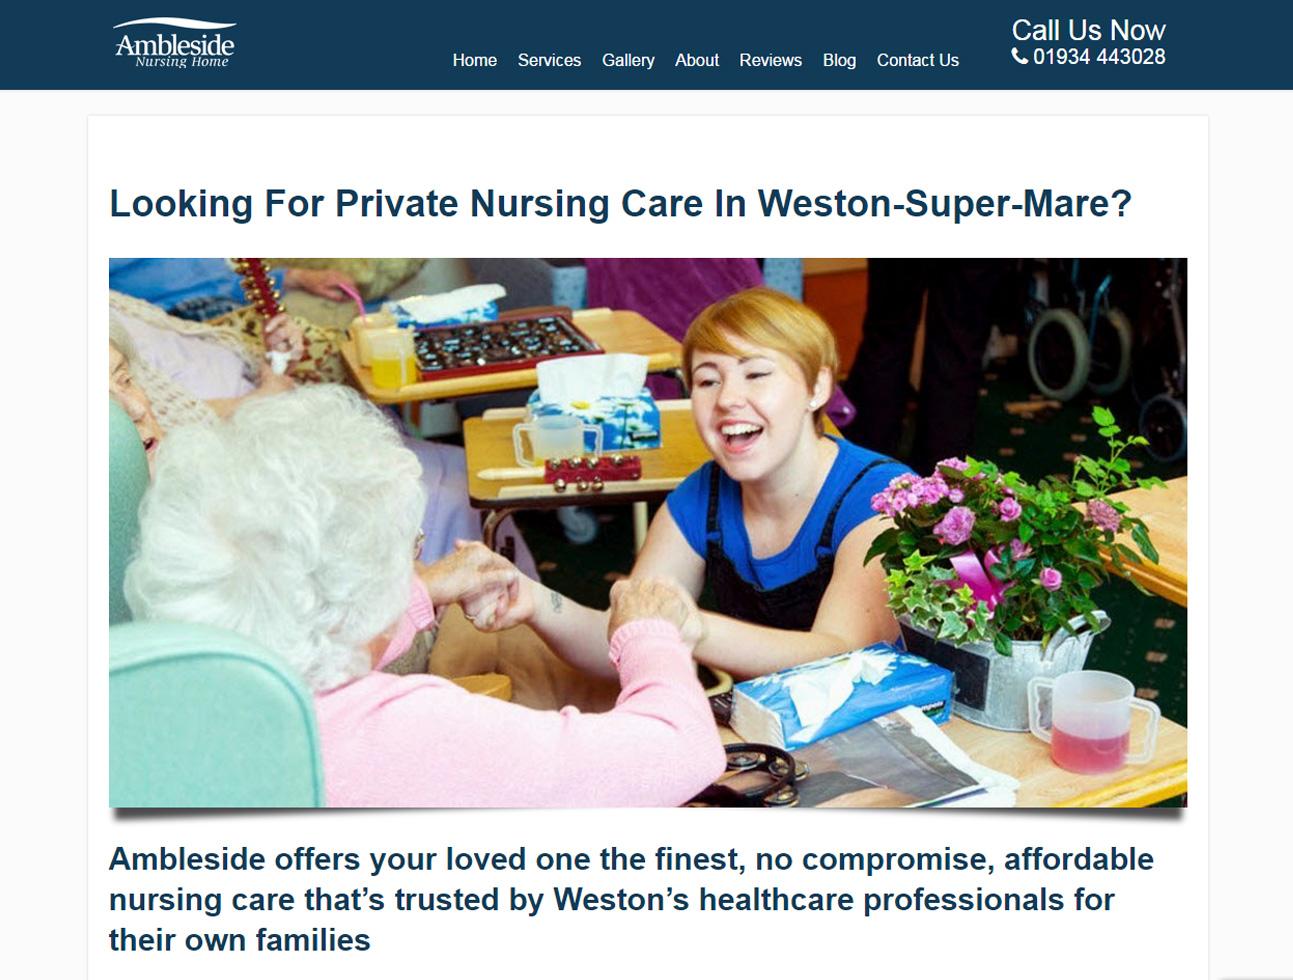 ambleside-nursing-home